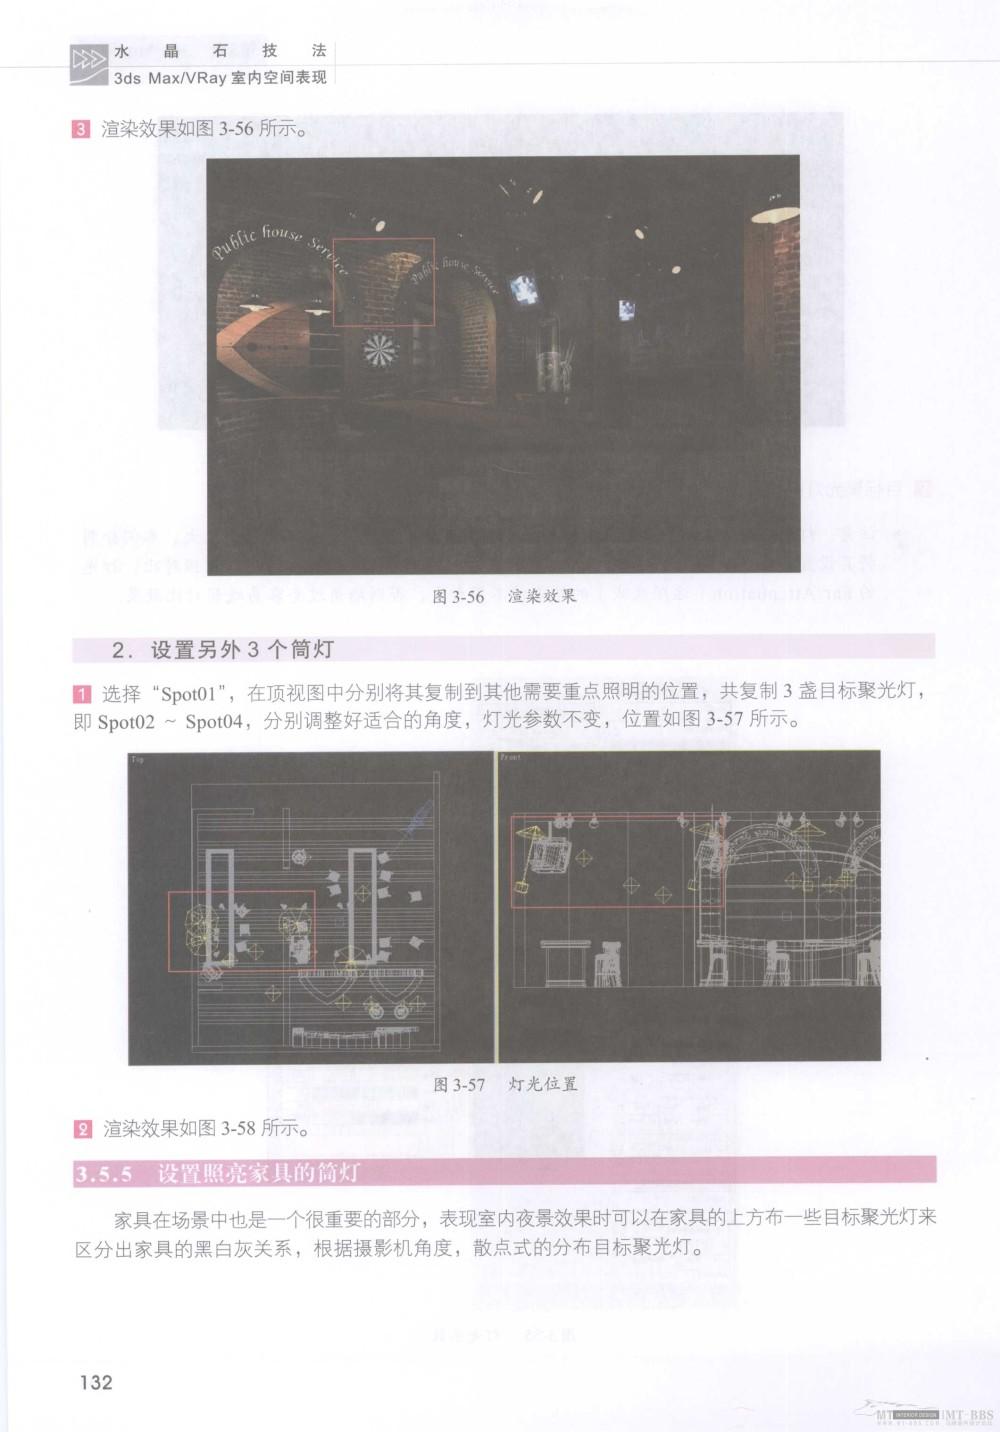 水晶石技法-3ds_Max&VRay室内空间表现_水晶石技法-3ds_Max&VRay室内空间表现_页面_138.jpg